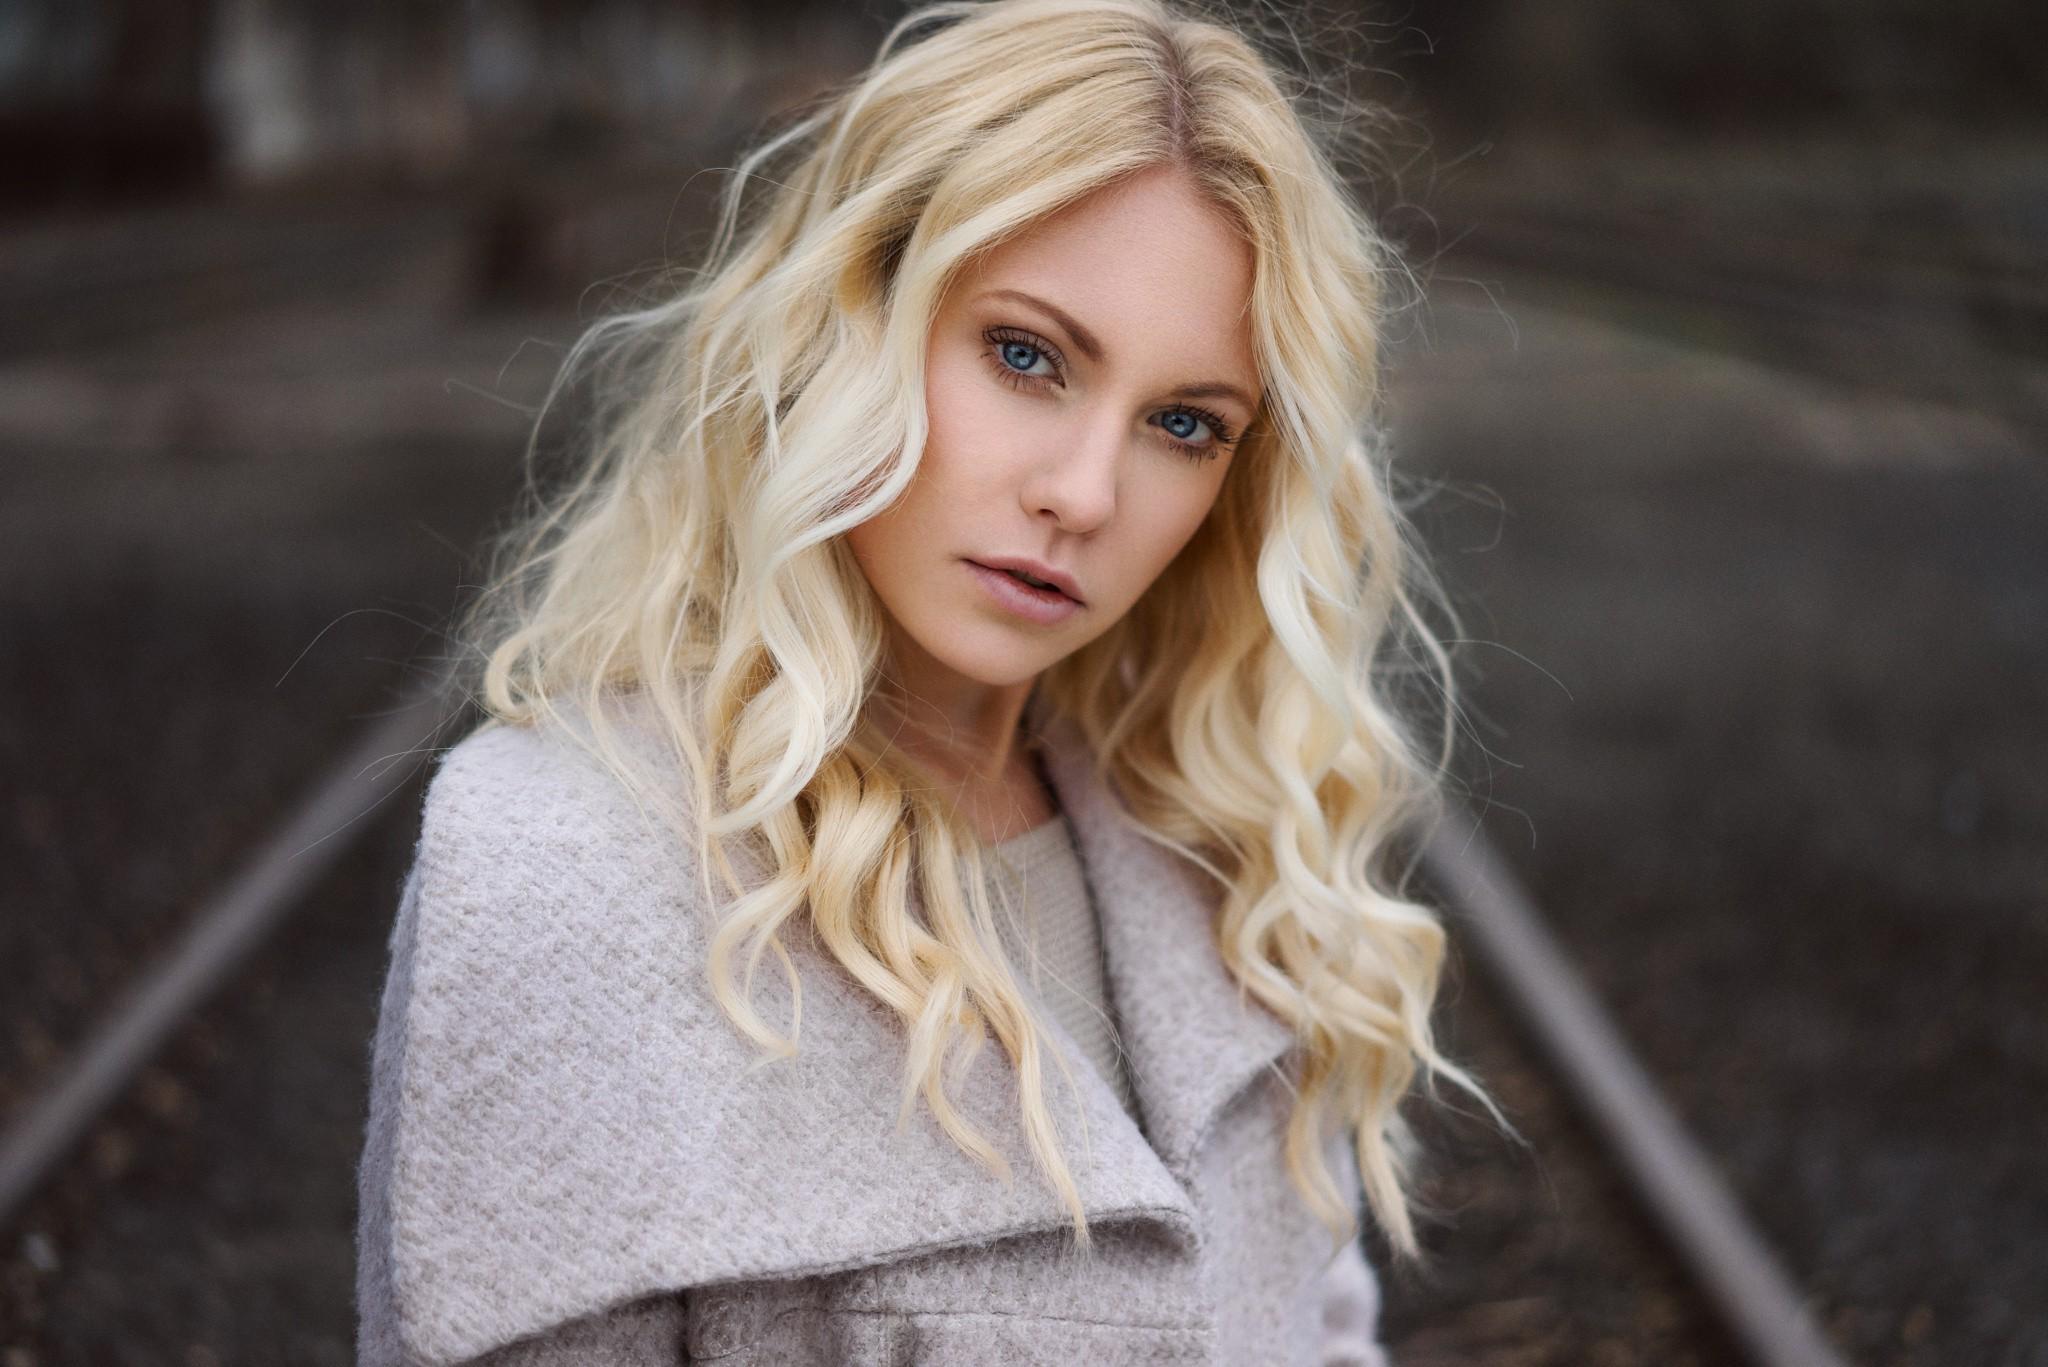 Wallpaper Face Model Blonde Long Hair Blue Eyes: Wallpaper : Face, Women Outdoors, Blonde, Depth Of Field